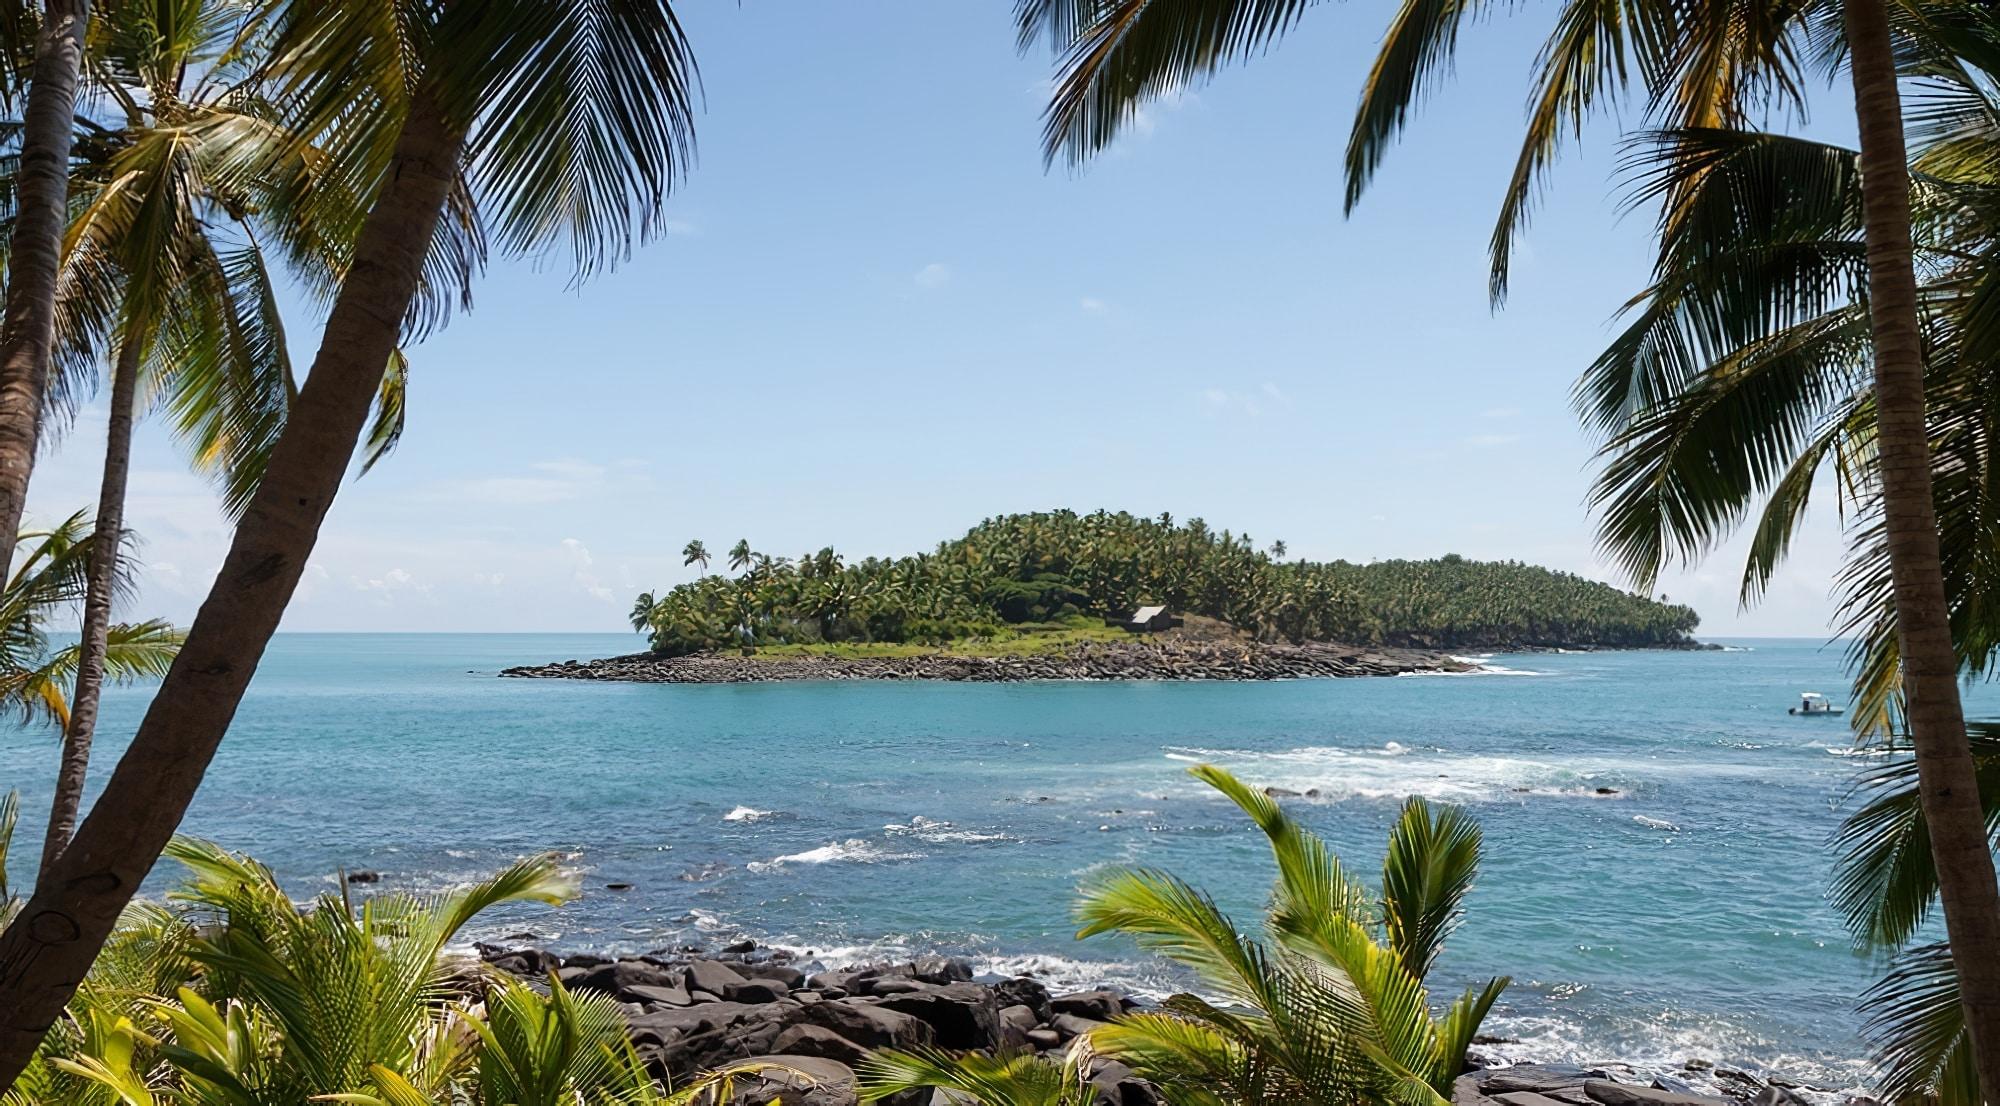 Visiter la Guyane française